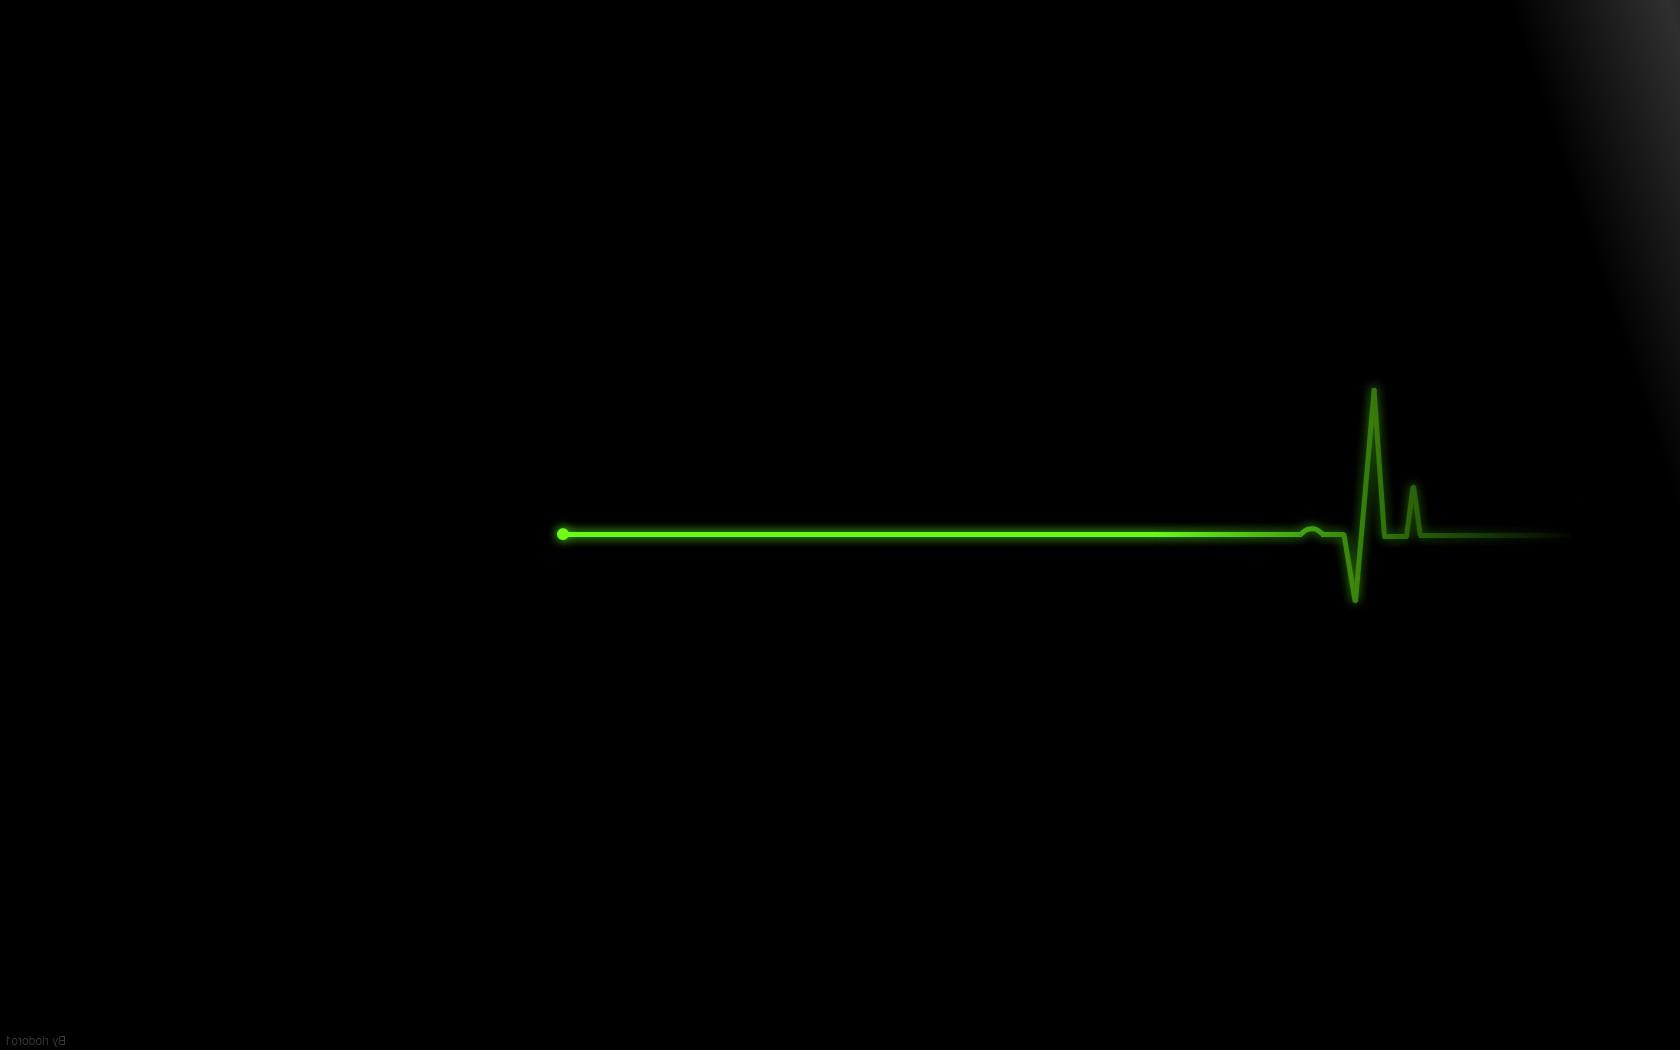 Wallpaper Lens Flare Heartbeat Shape Line Symbol Screenshot